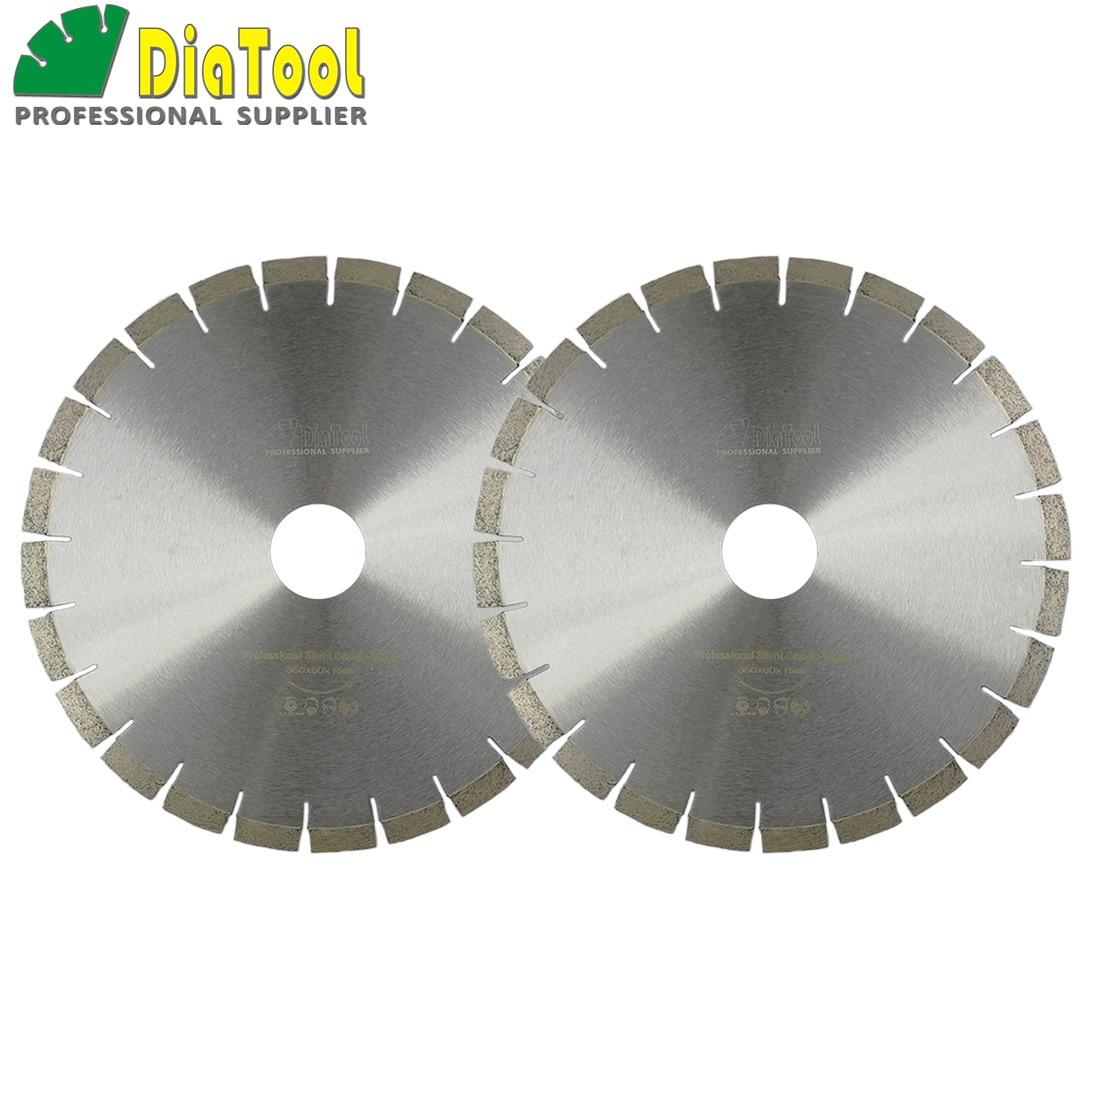 DIATOOL 2pcs 14 Diamond Silent Saw Blade Sandwich Steel Core Cutting Disc Bore 60mm Granite Blade Diamond Wheel Disk vitaly mushkin erotic stories top ten